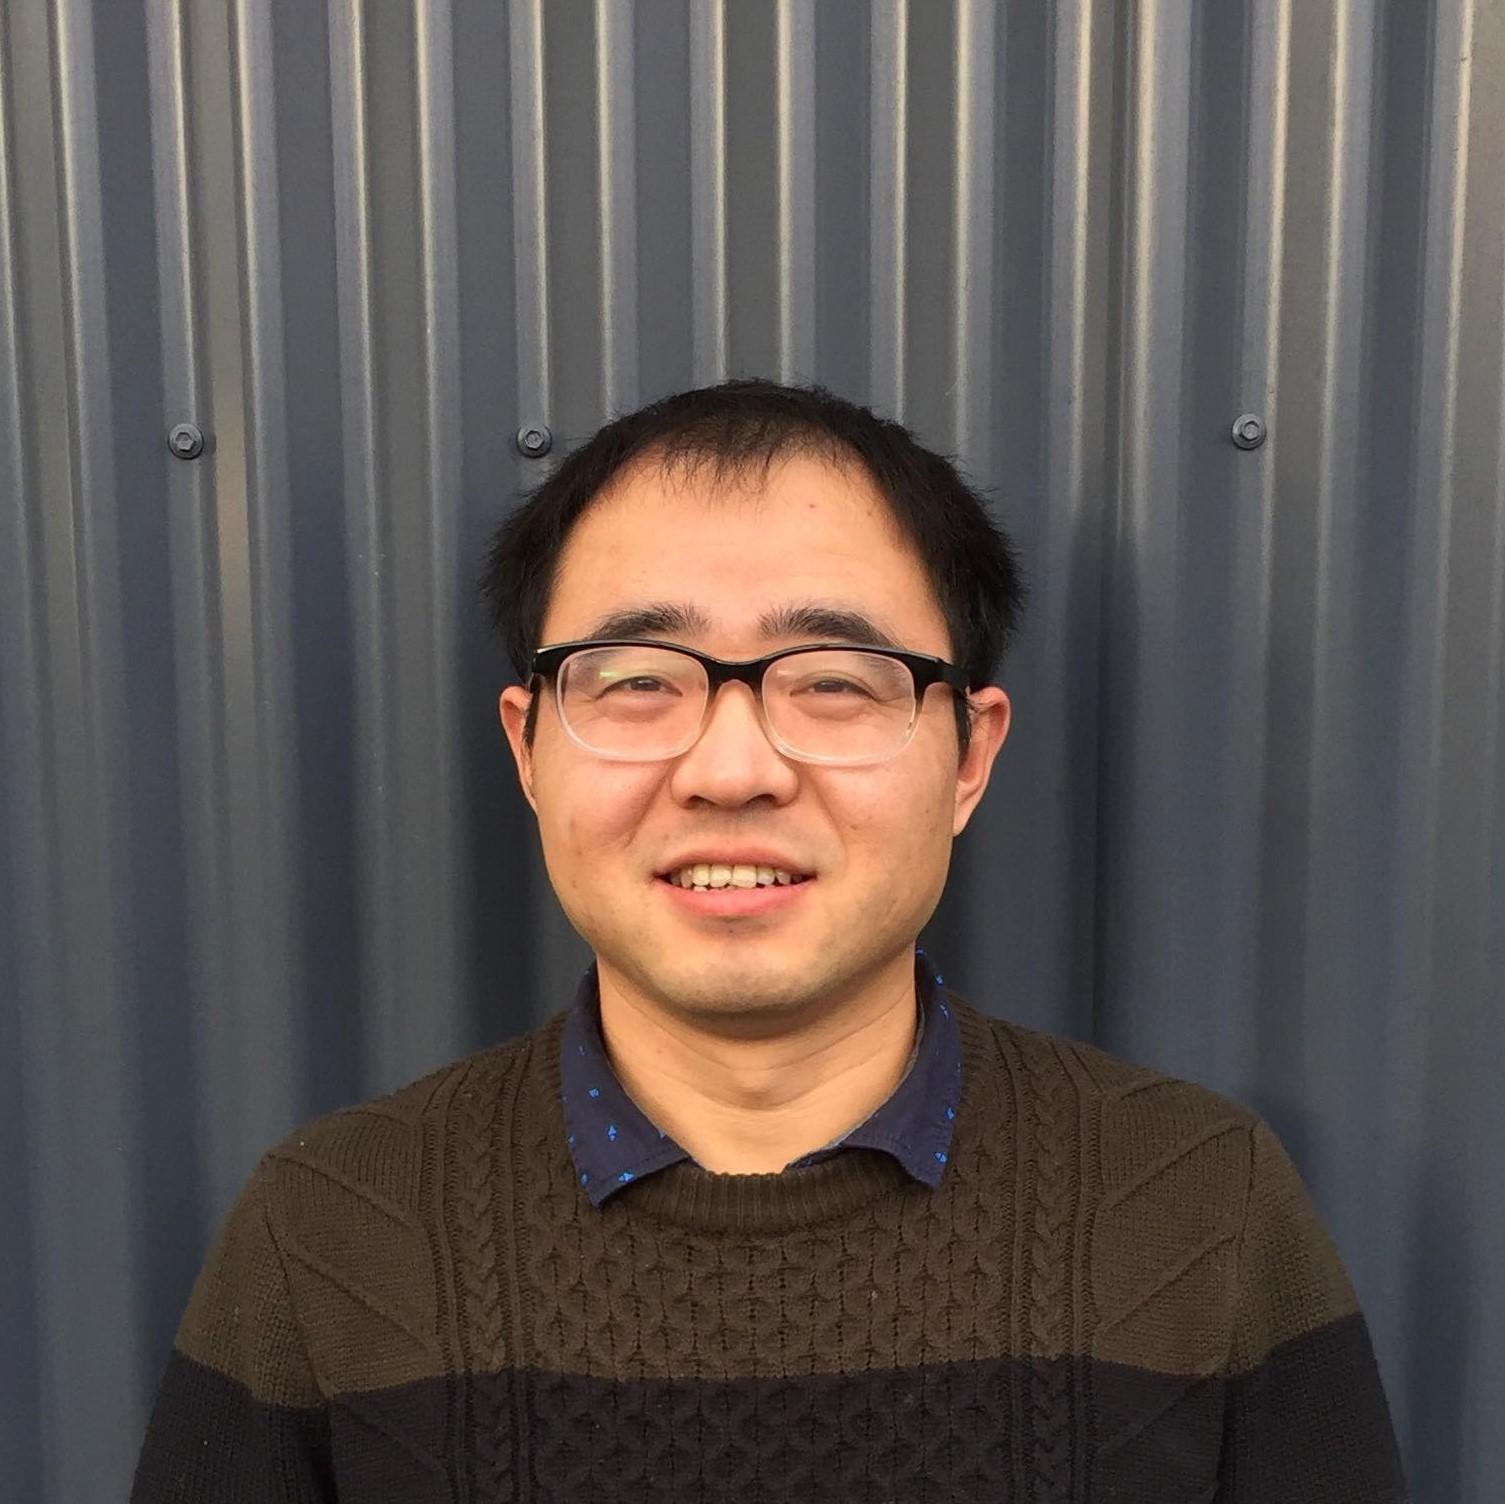 Photo of Damien Jiang